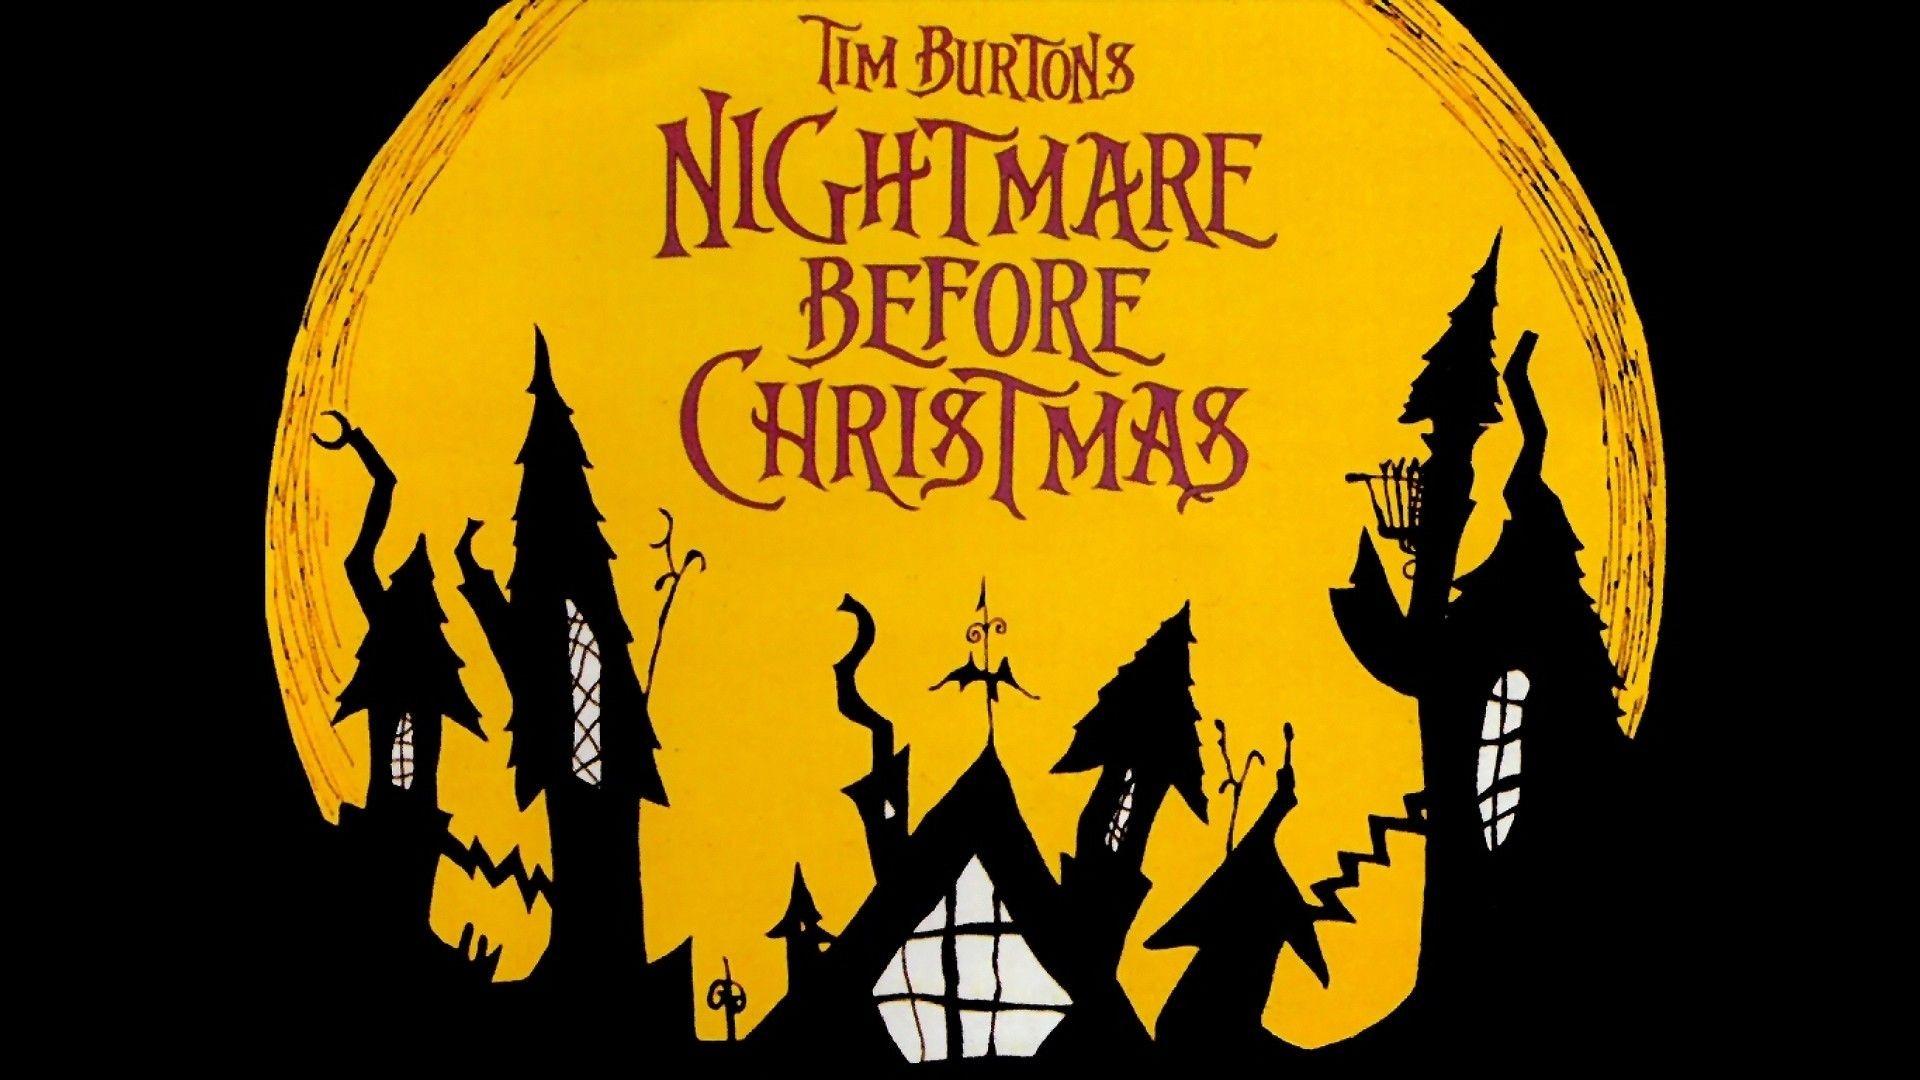 Nightmare Before Christmas wallpaper ·① Download free beautiful ...